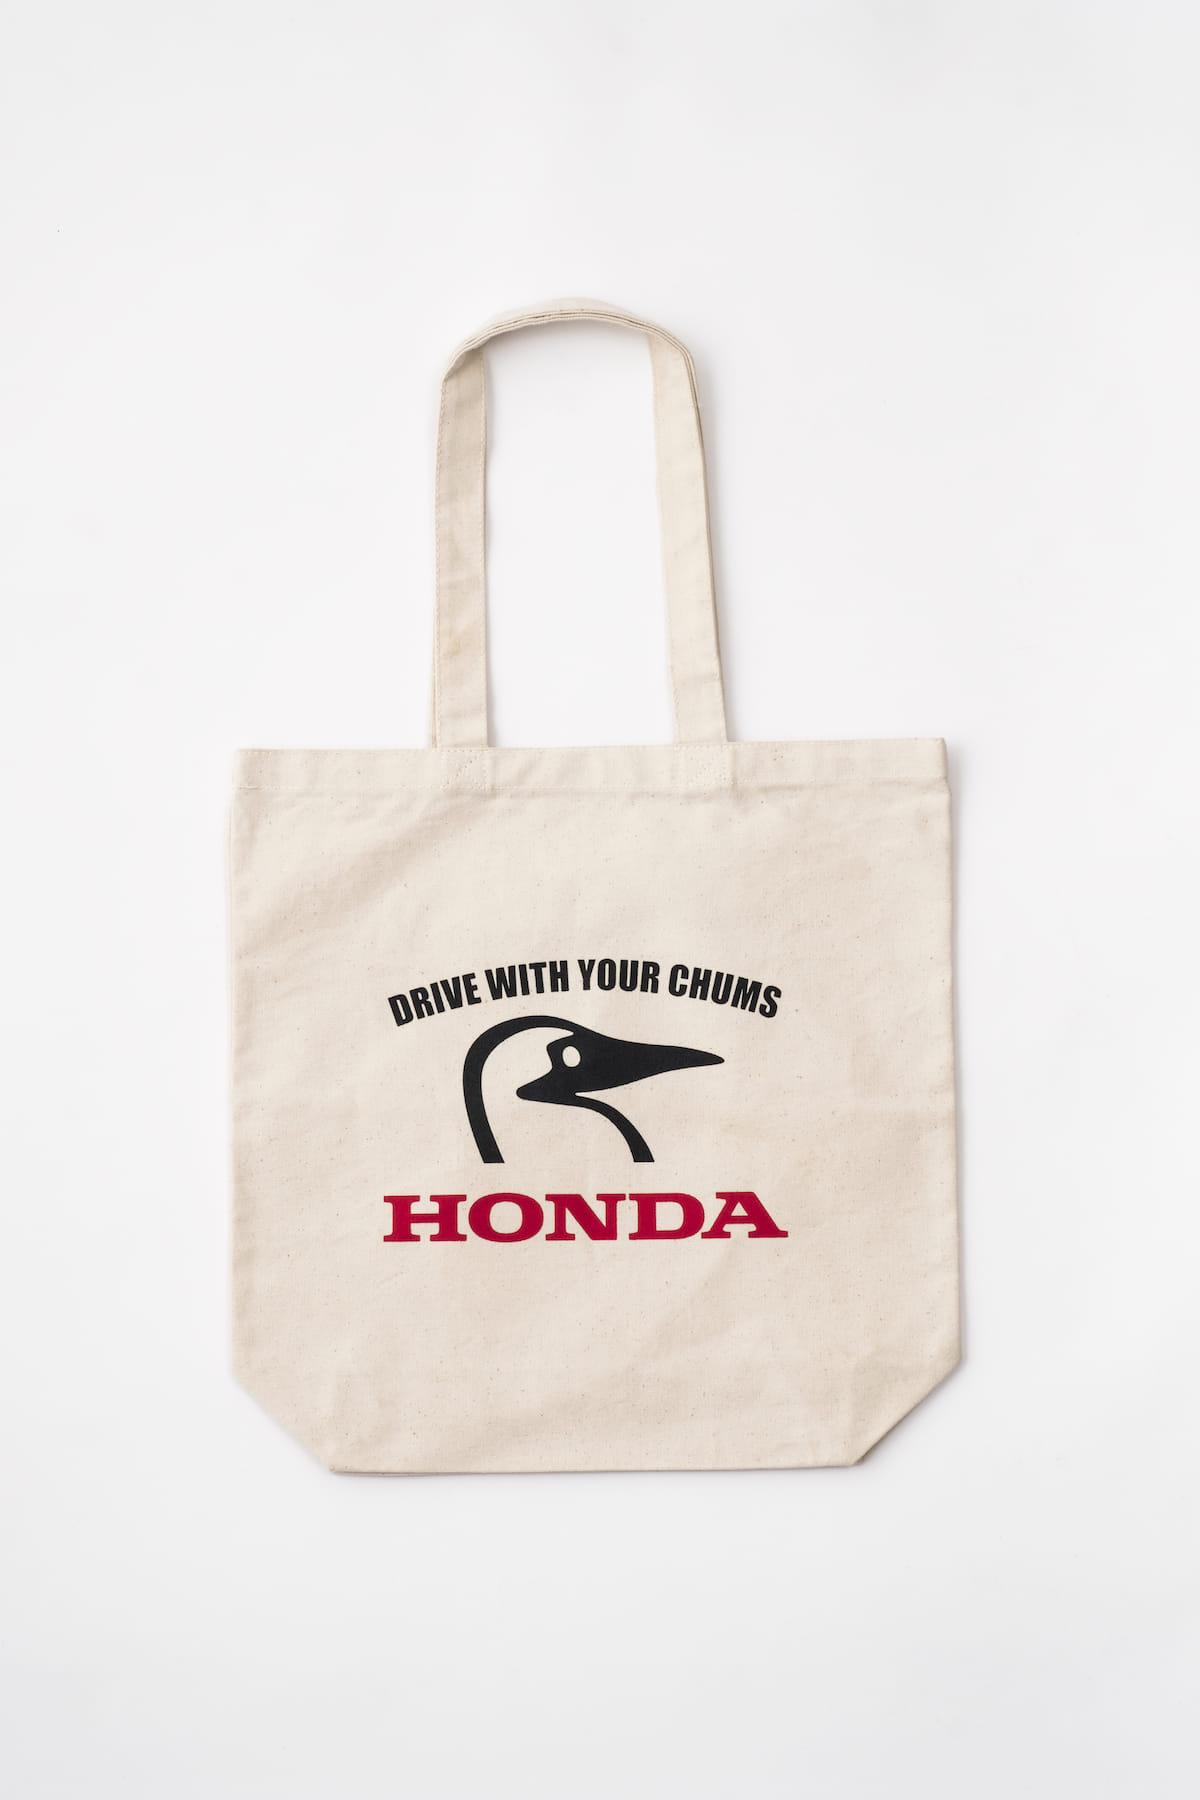 「Honda Access × CHUMS」が初めてのアパレルグッズを発売!35周年のアニバーサリーイヤーに強力タッグが帰ってきた! fashion180420_chums_1-1200x1800